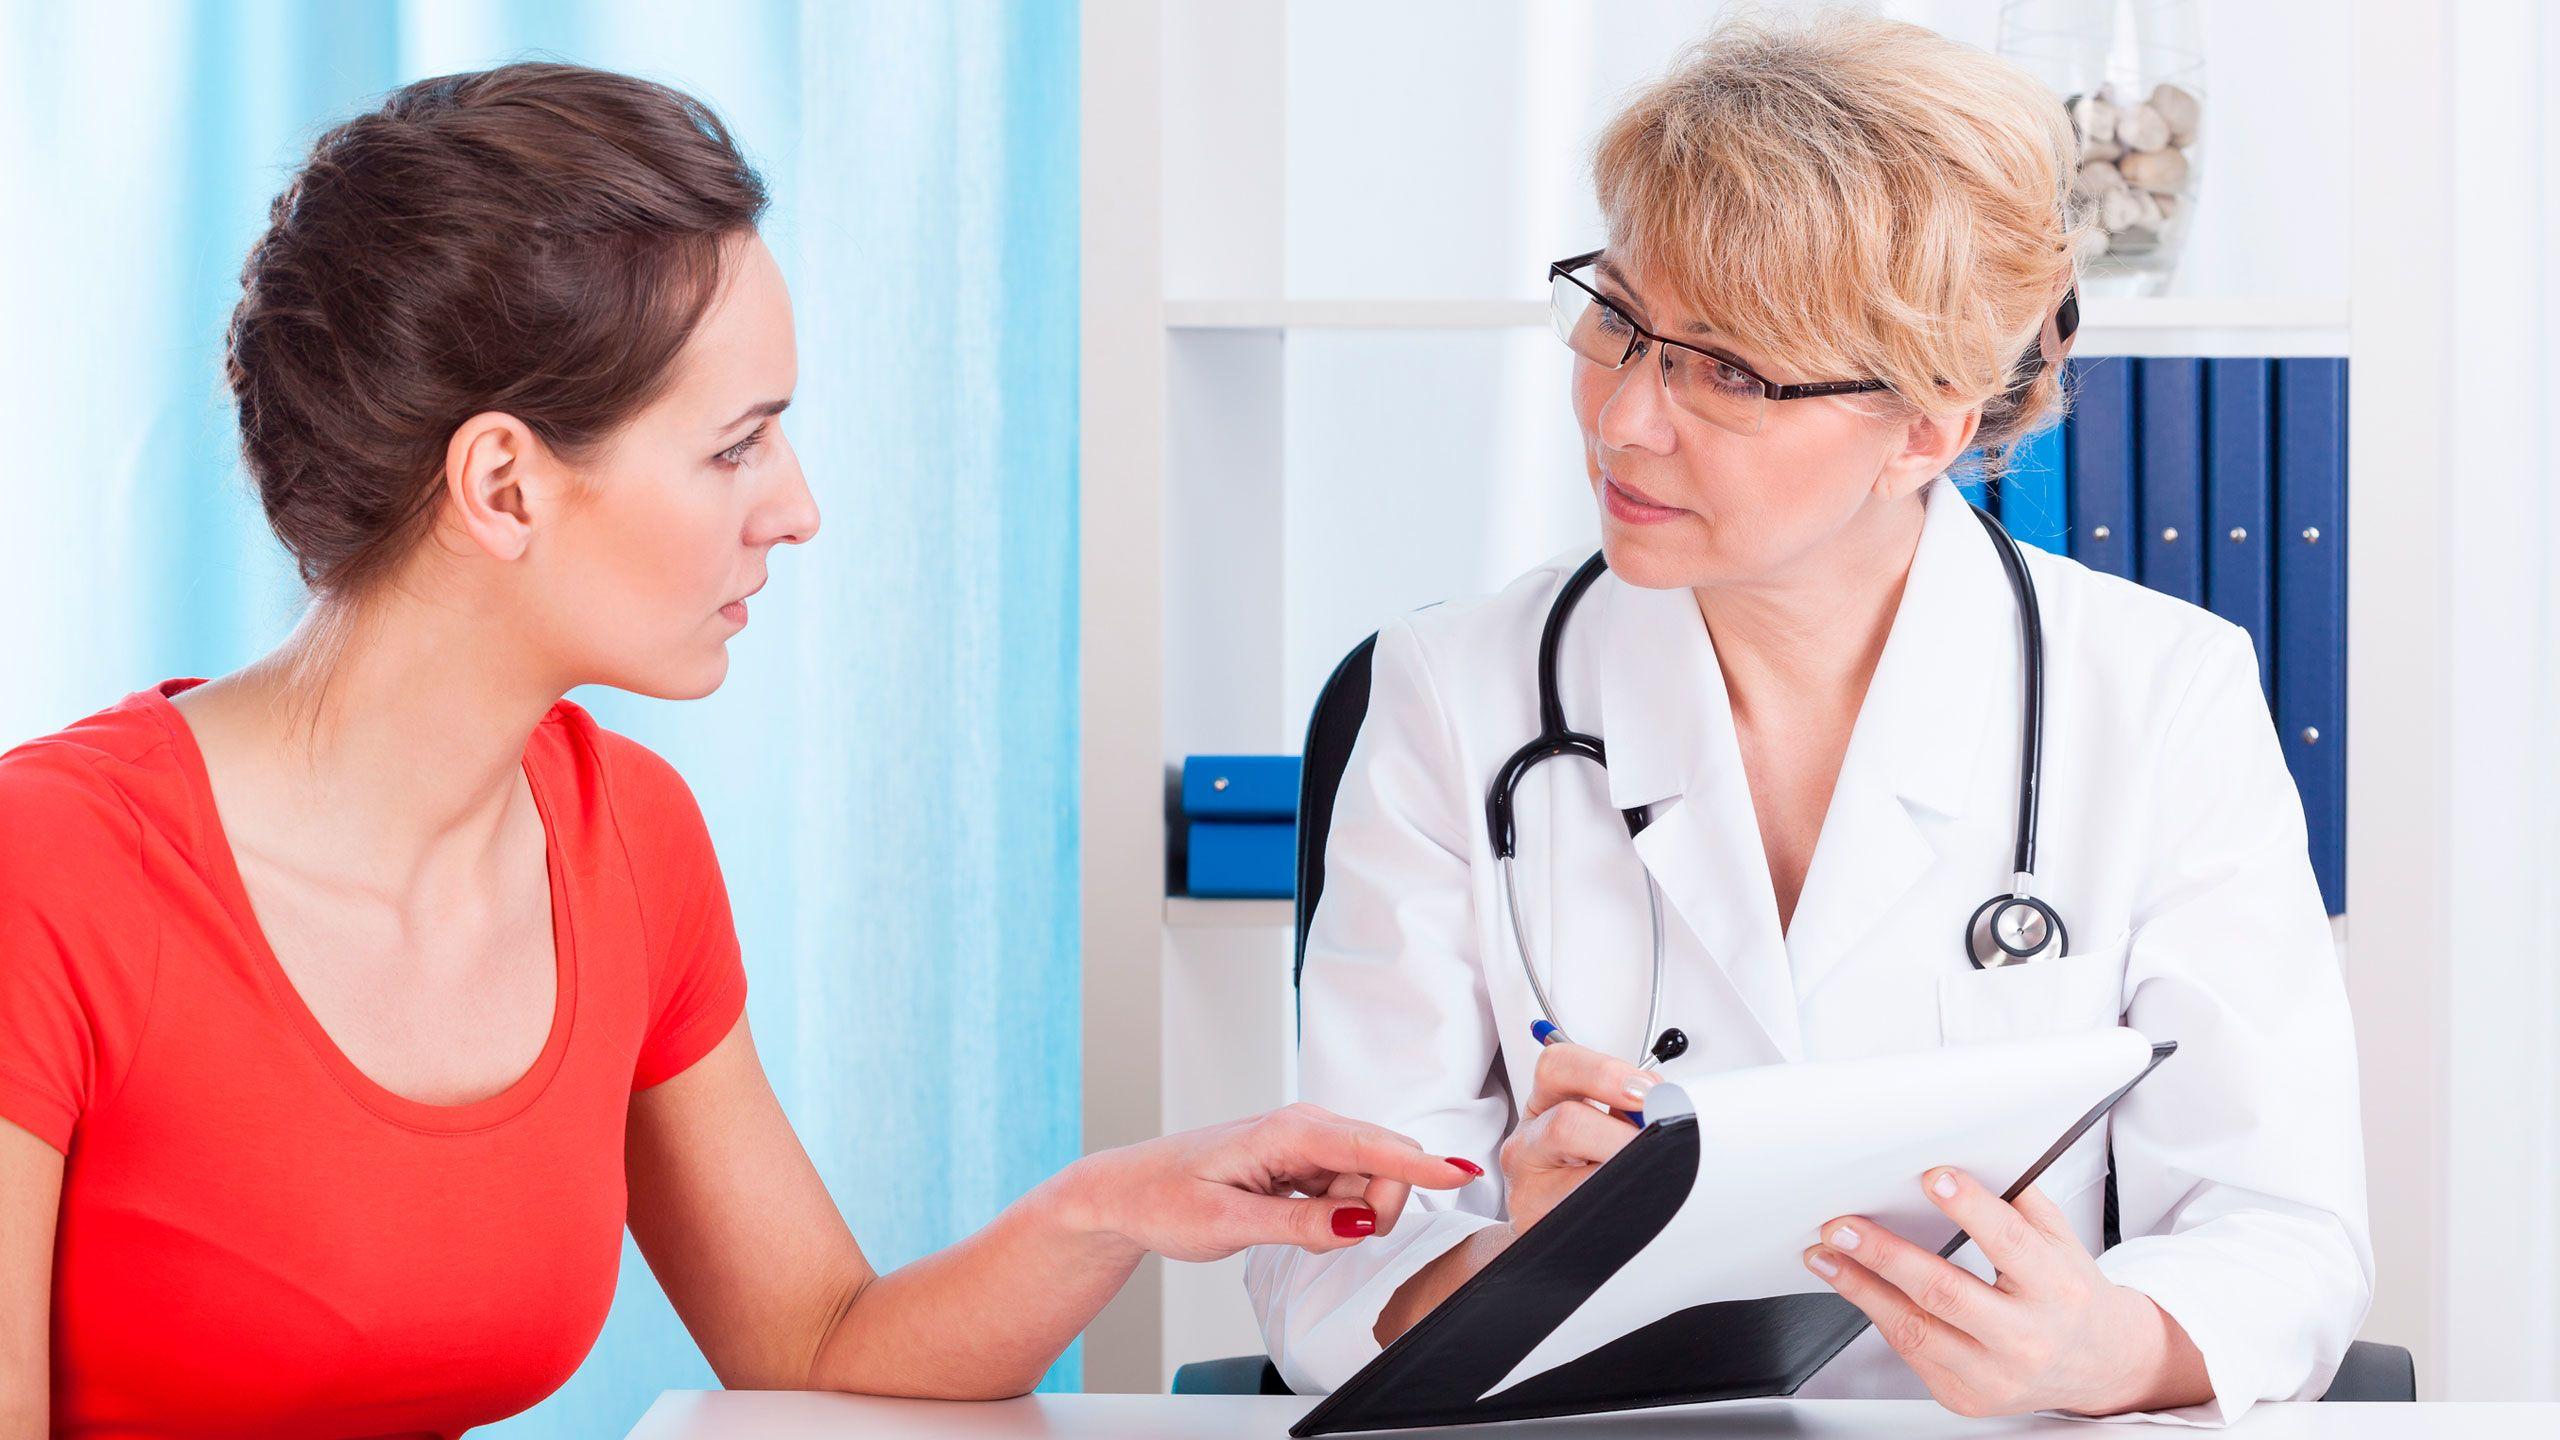 time-see-doctor-rheumatoid-arthritis